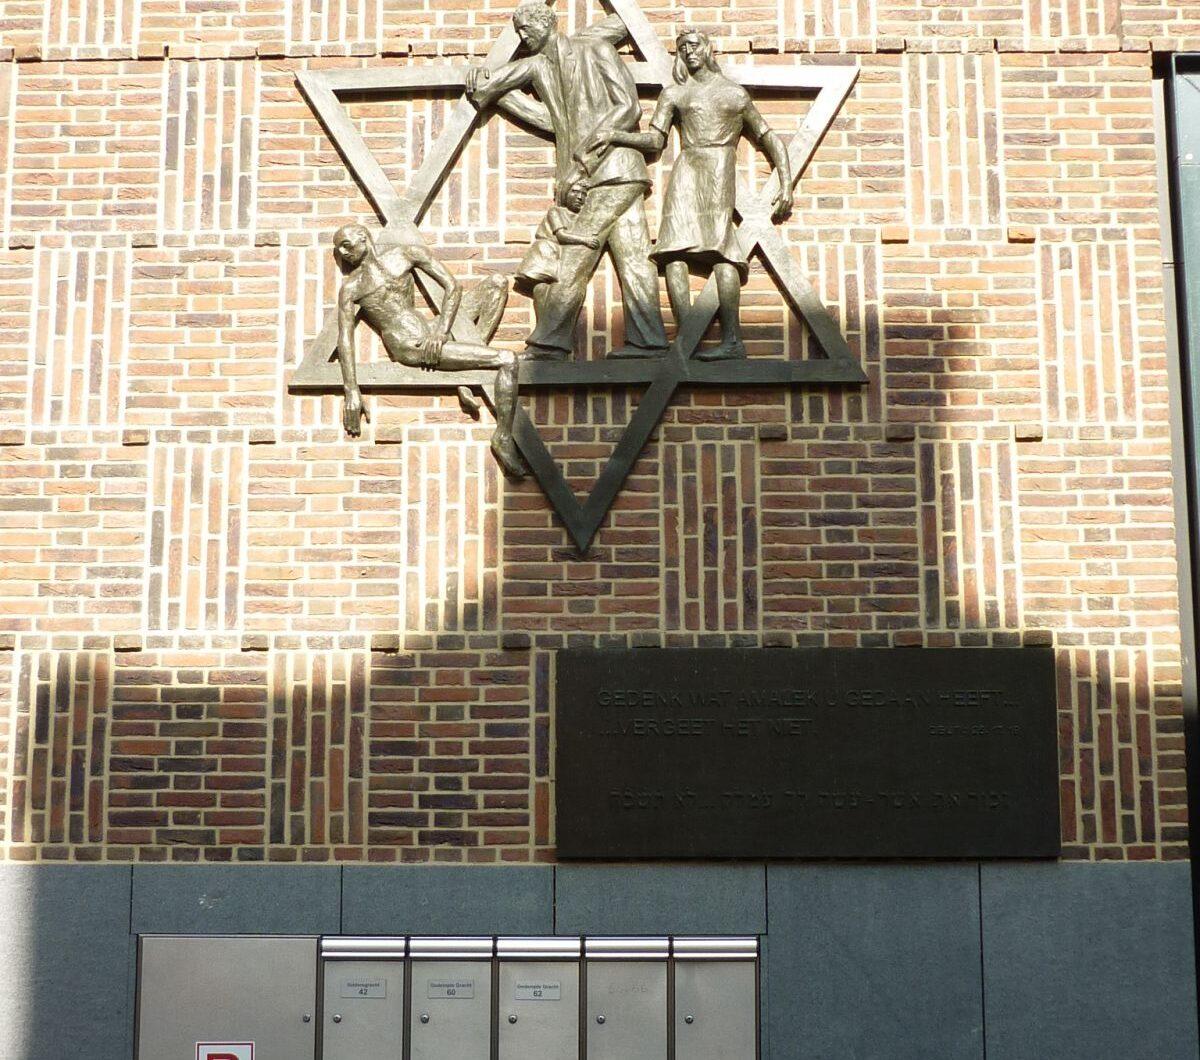 Den Haag, 'Davidster'